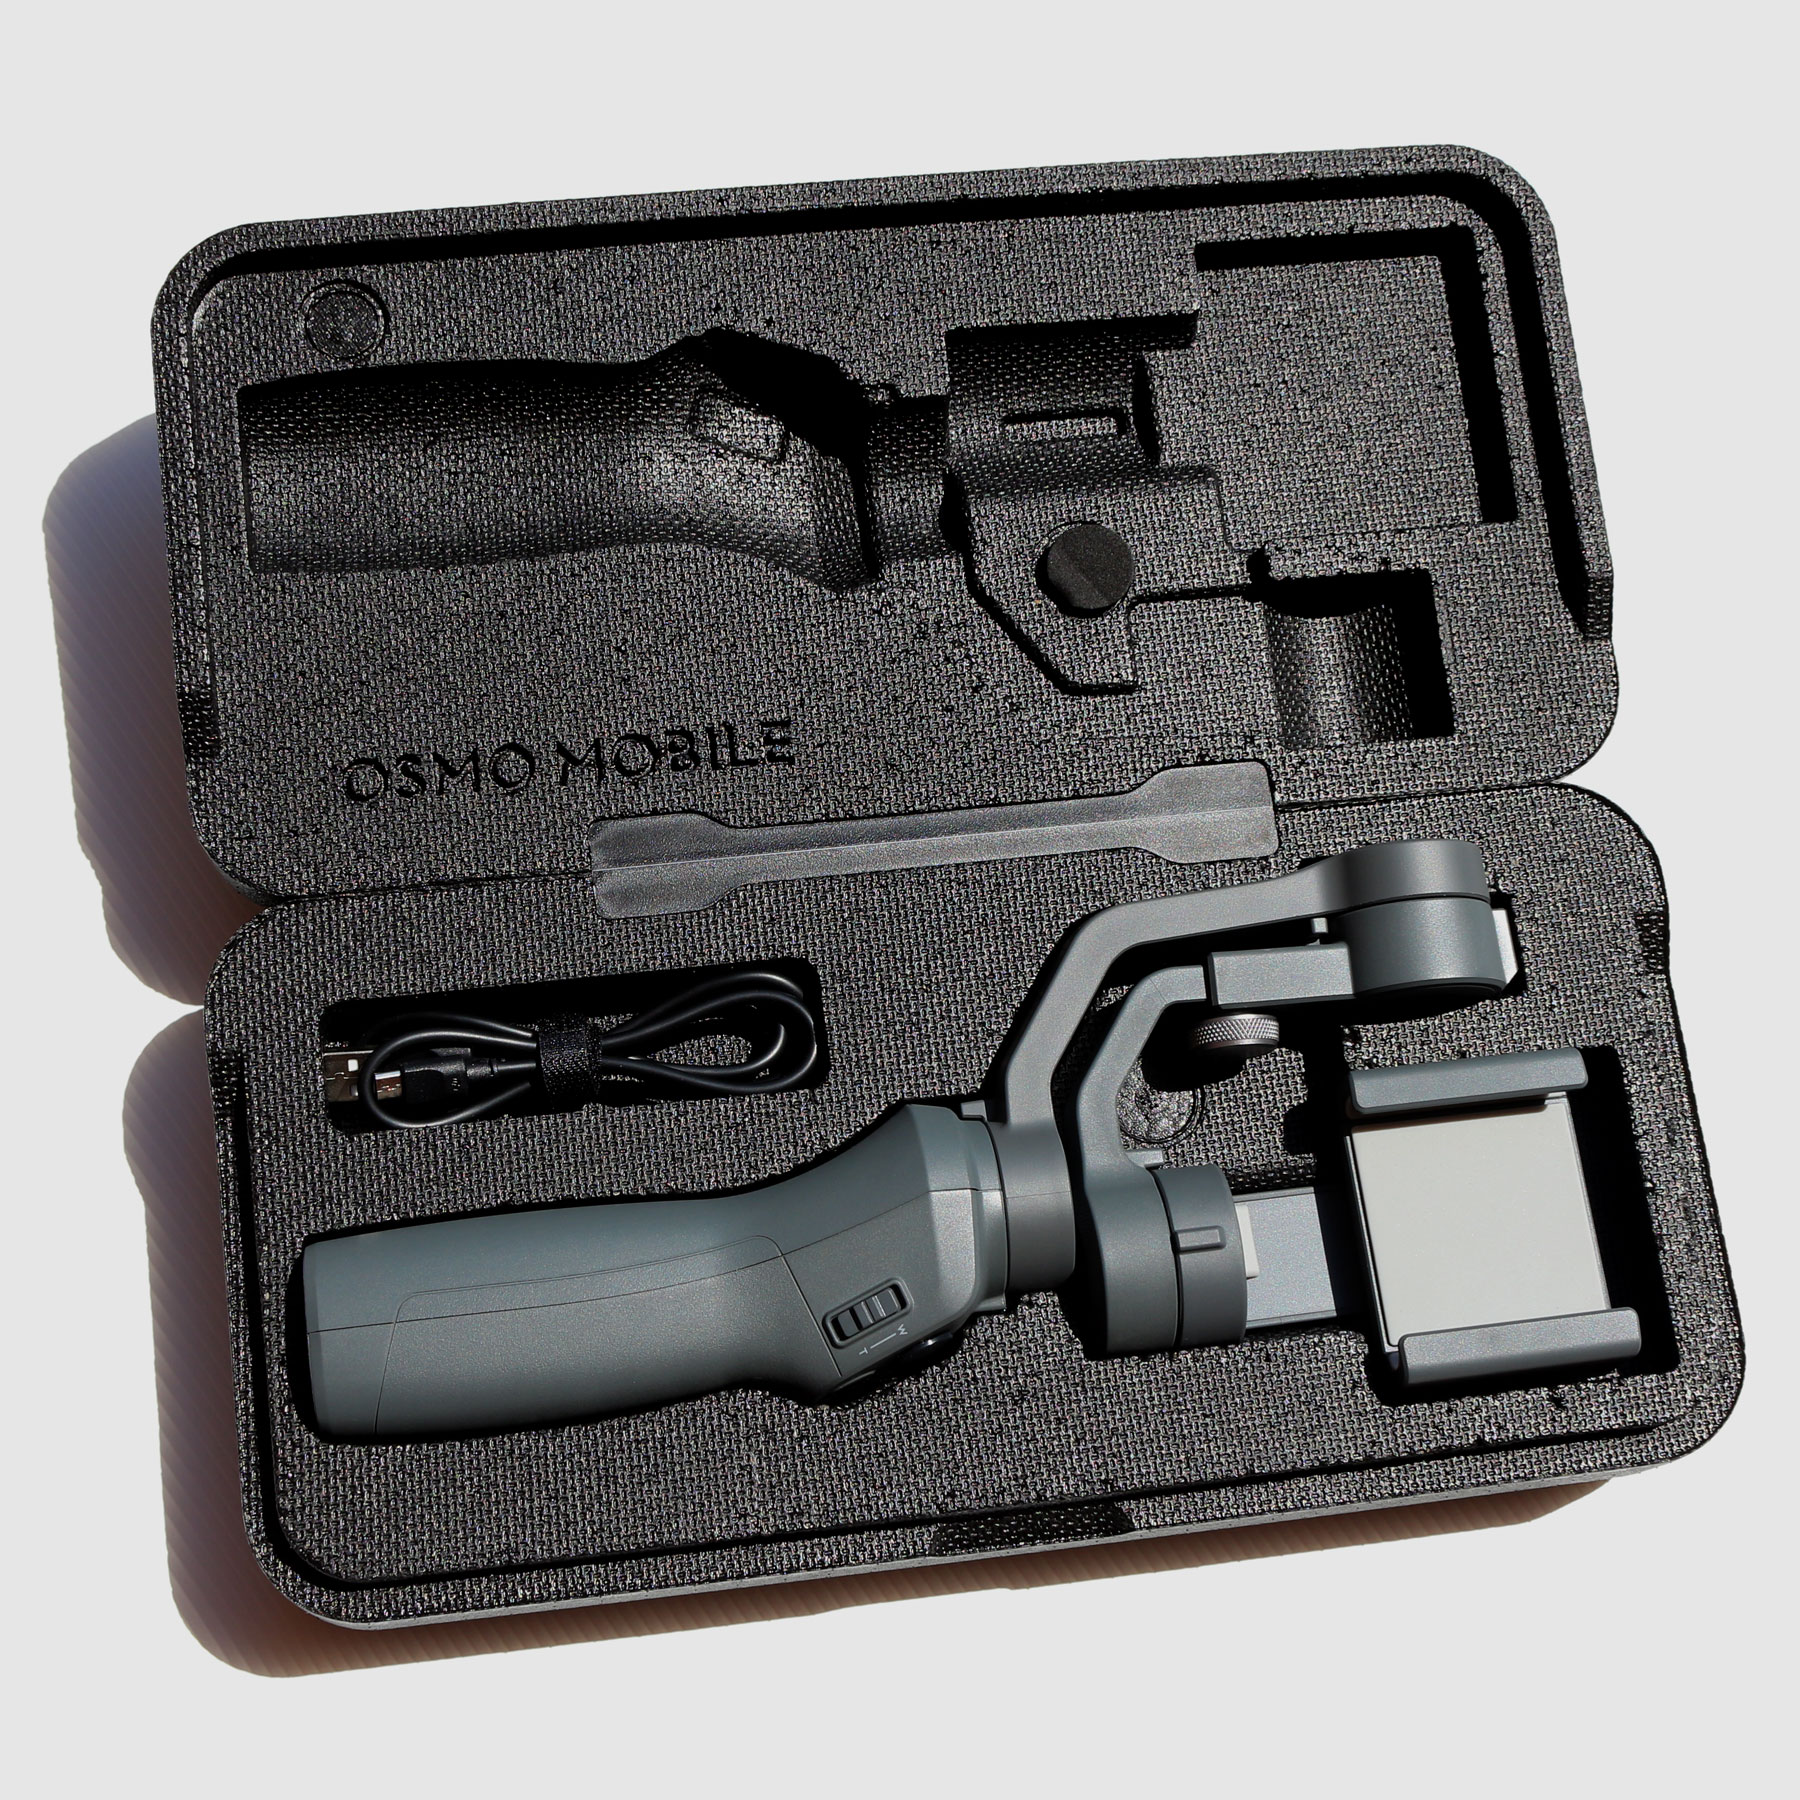 DJI Osmo Mobile 2 Estabilizador de imagen